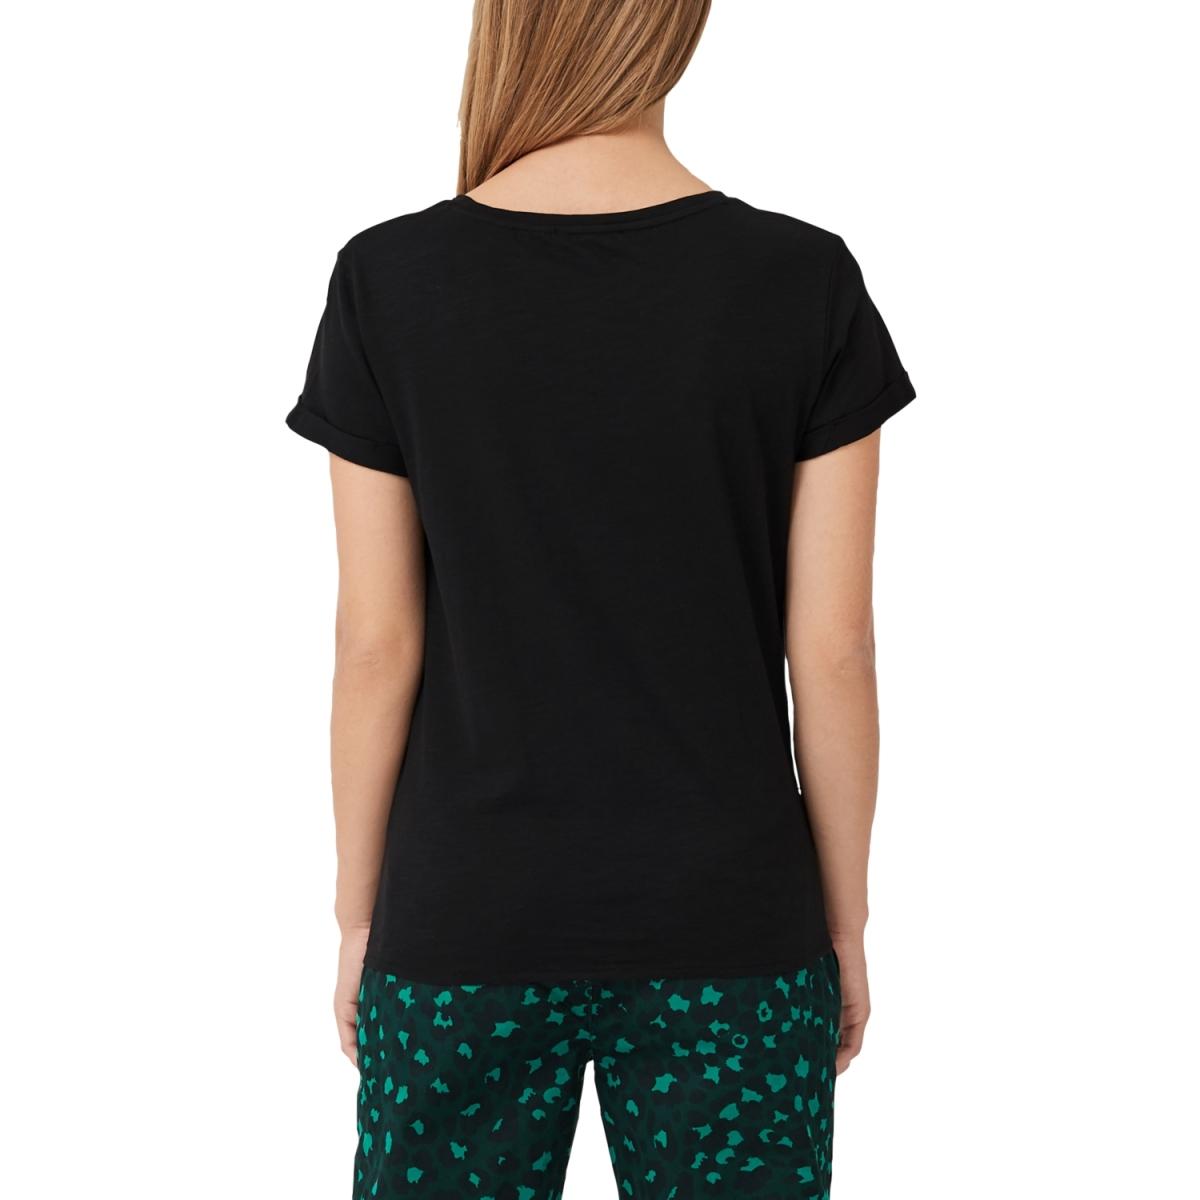 t shirt 21907324551 s.oliver t-shirt 9999